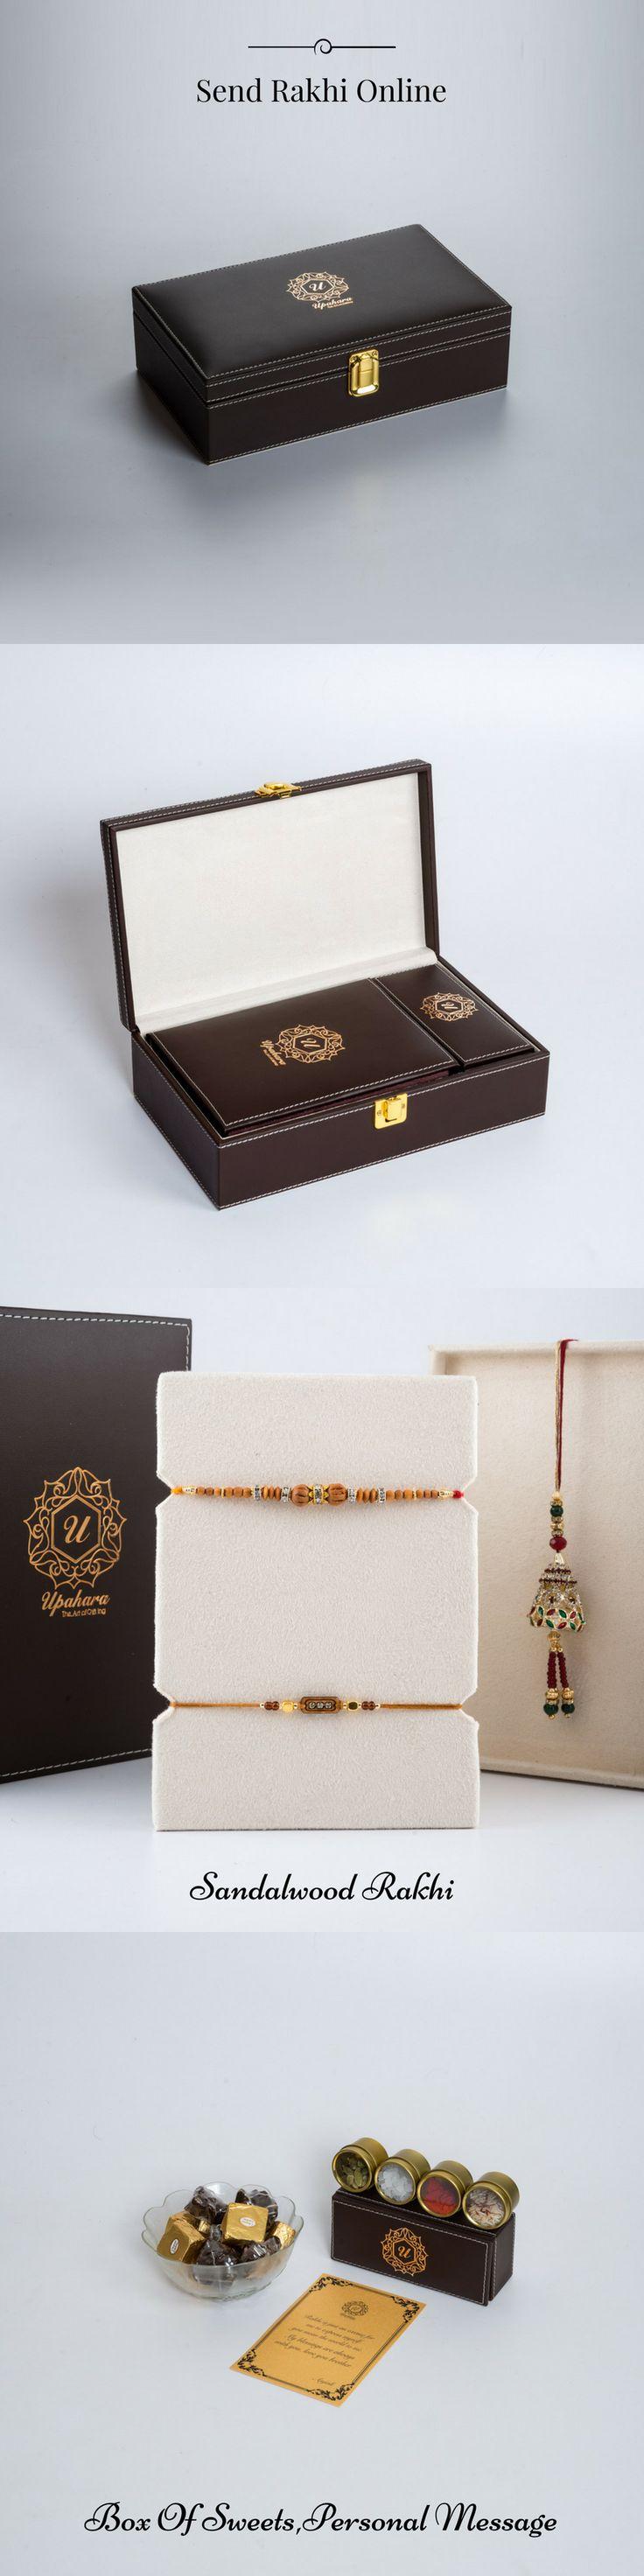 Luxury Rakhi Collection #sendrakhitousa Send Rakhi Online #sendrakhitoUK #PremiumRakhi #StoneRakhi #OnlineRakhi #upahararakhi #sendrakhiindia #sendrakhiAustralia #BhabhiRakhi #goldrakhiusa #pearlrakhi #sendrakhitodubai #sendrakhitokuwait #worldwidesell #sandalwood #sandalwoodrakhi #sendrakhi #online #silverrakhi #gold #rakhi #onlineshopping #shopping #fordaugher #rakshabandhan